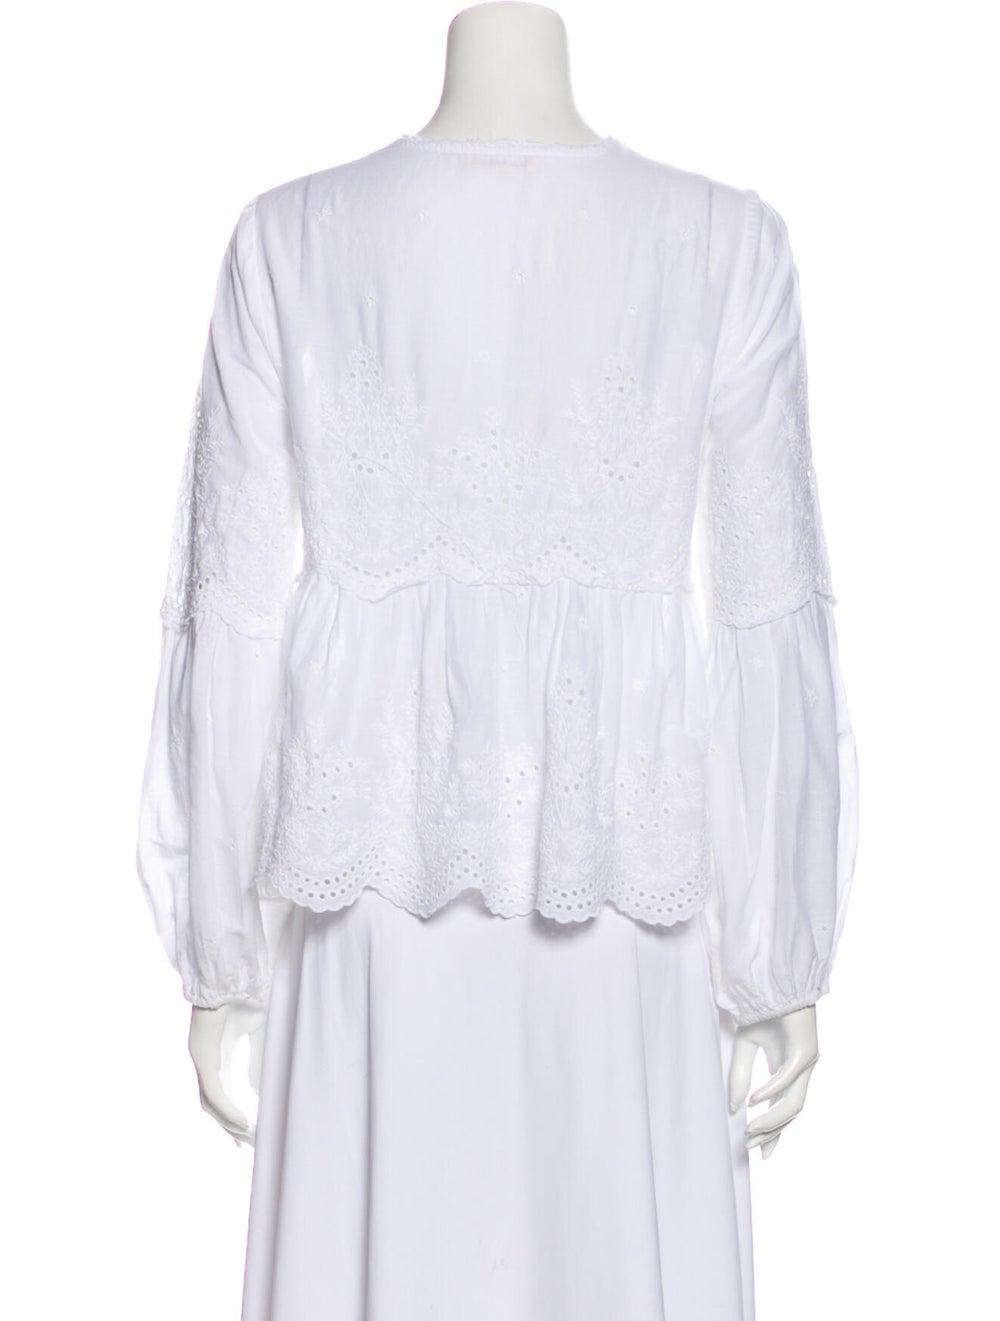 Ulla Johnson Lace Pattern V-Neck Blouse White - image 3